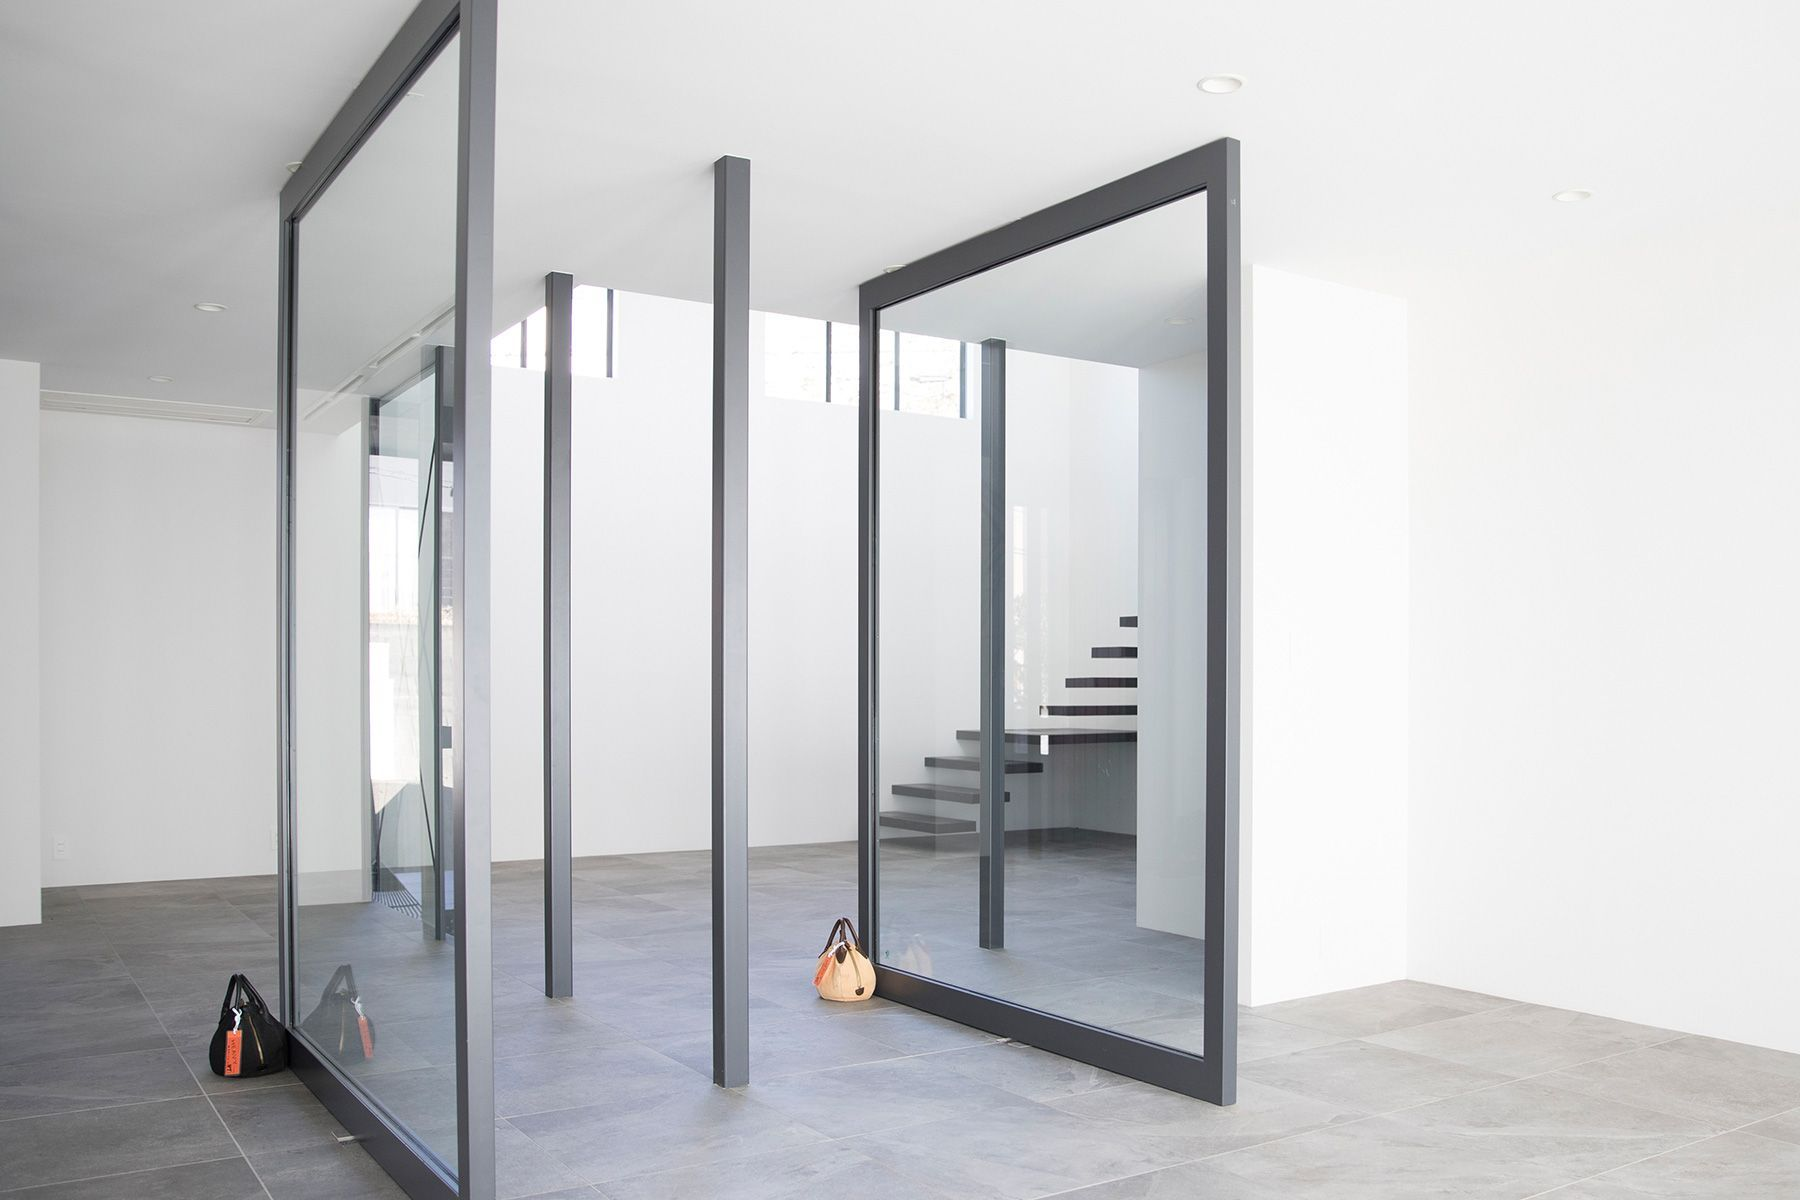 M/N STUDIO HAYAMA (エムエヌ スタジオ ハヤマ)1F 左右90°回転するガラス扉